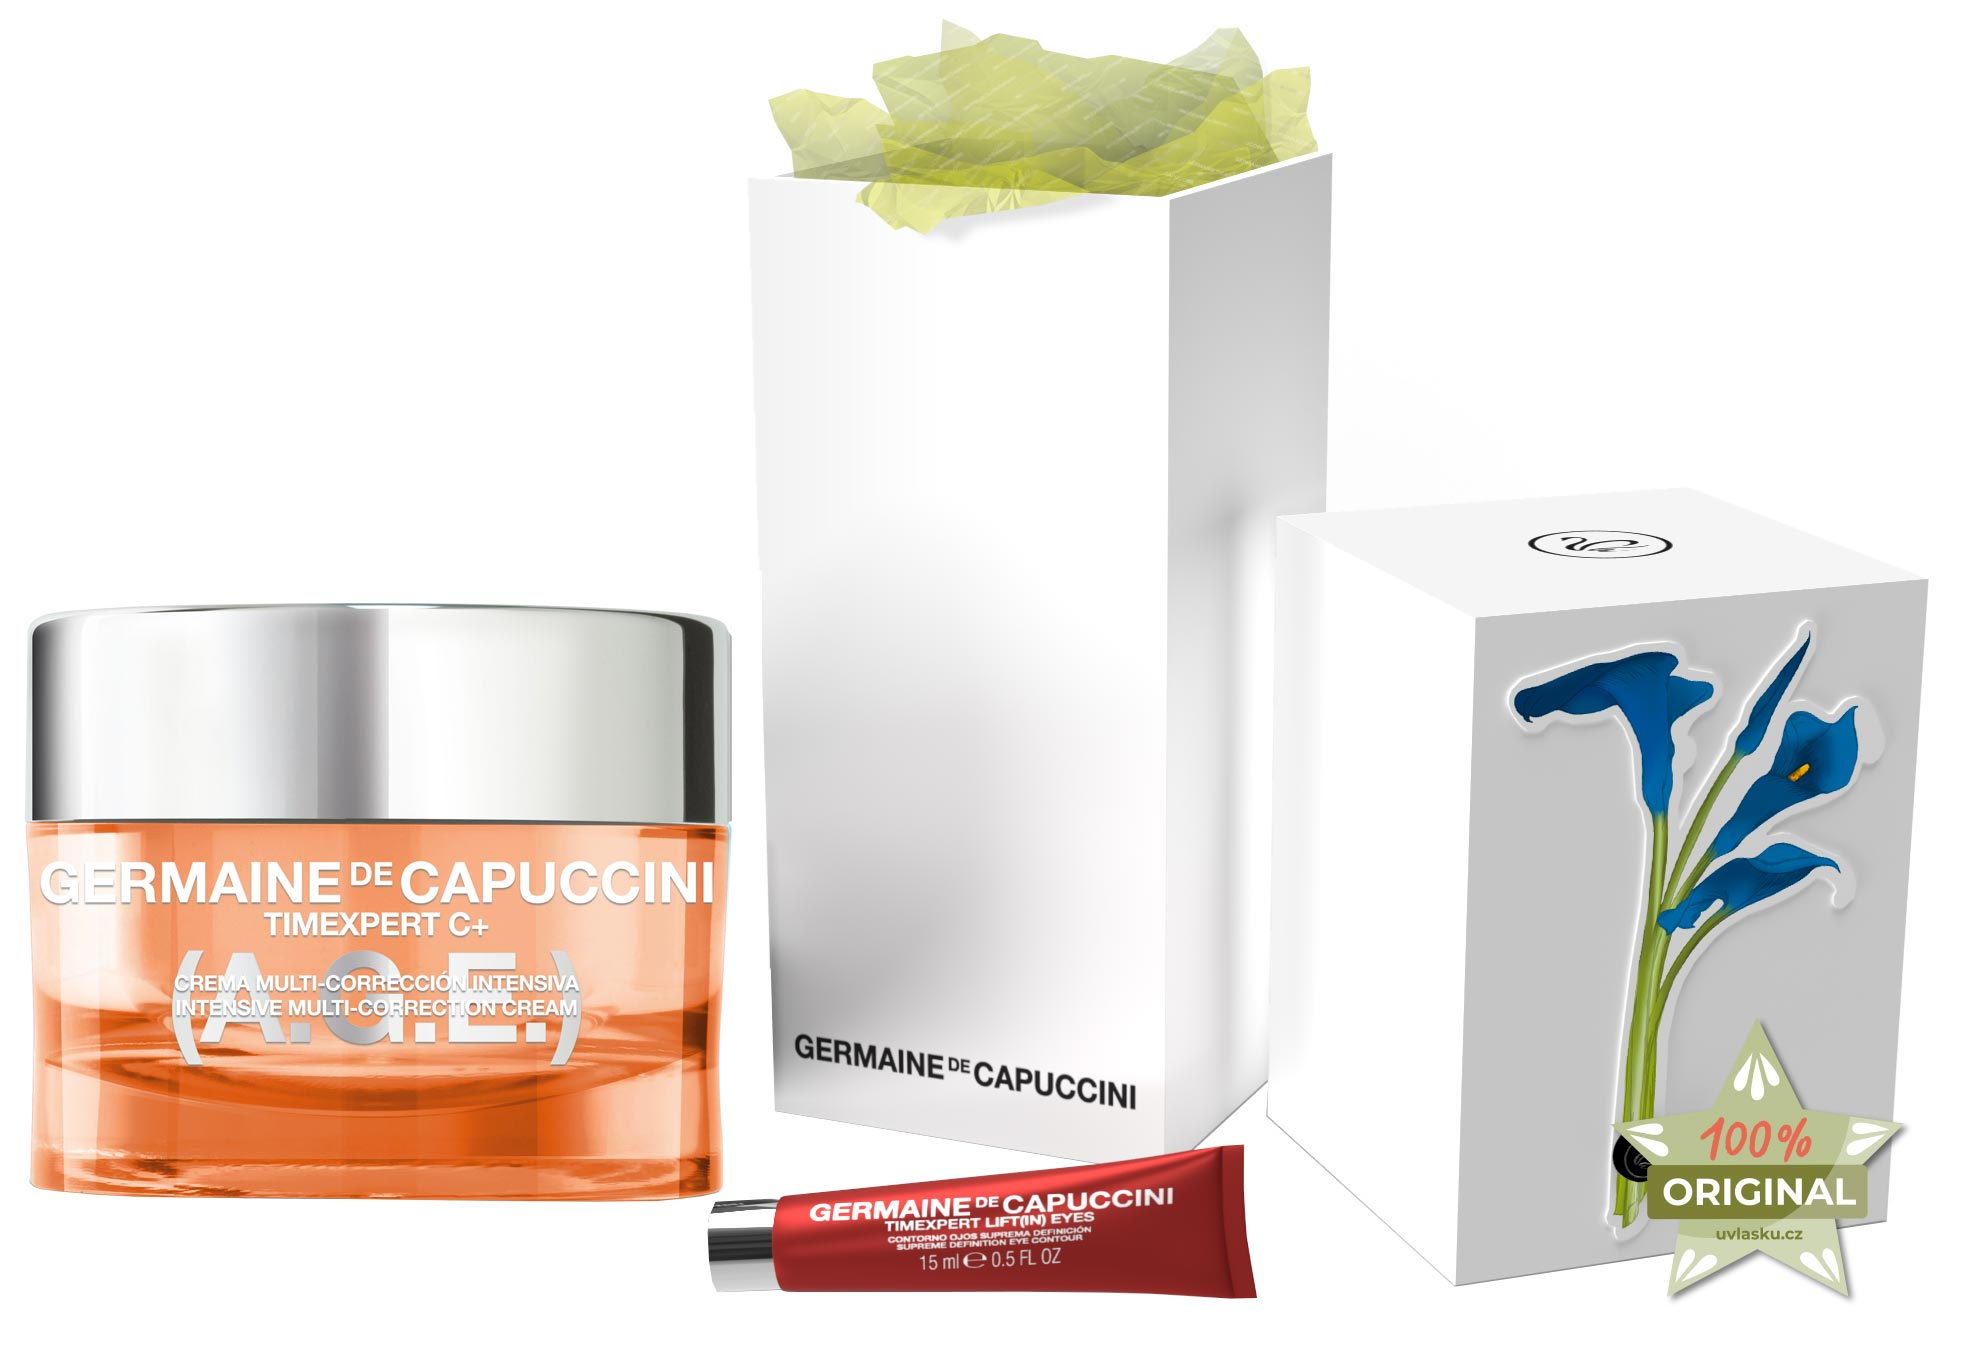 Germaine de Capuccini Timexpert C+ A.G.E. Christmas Sada - krém s vitamínem C pro normální pleť 50ml + sérum na oční okolí 15ml